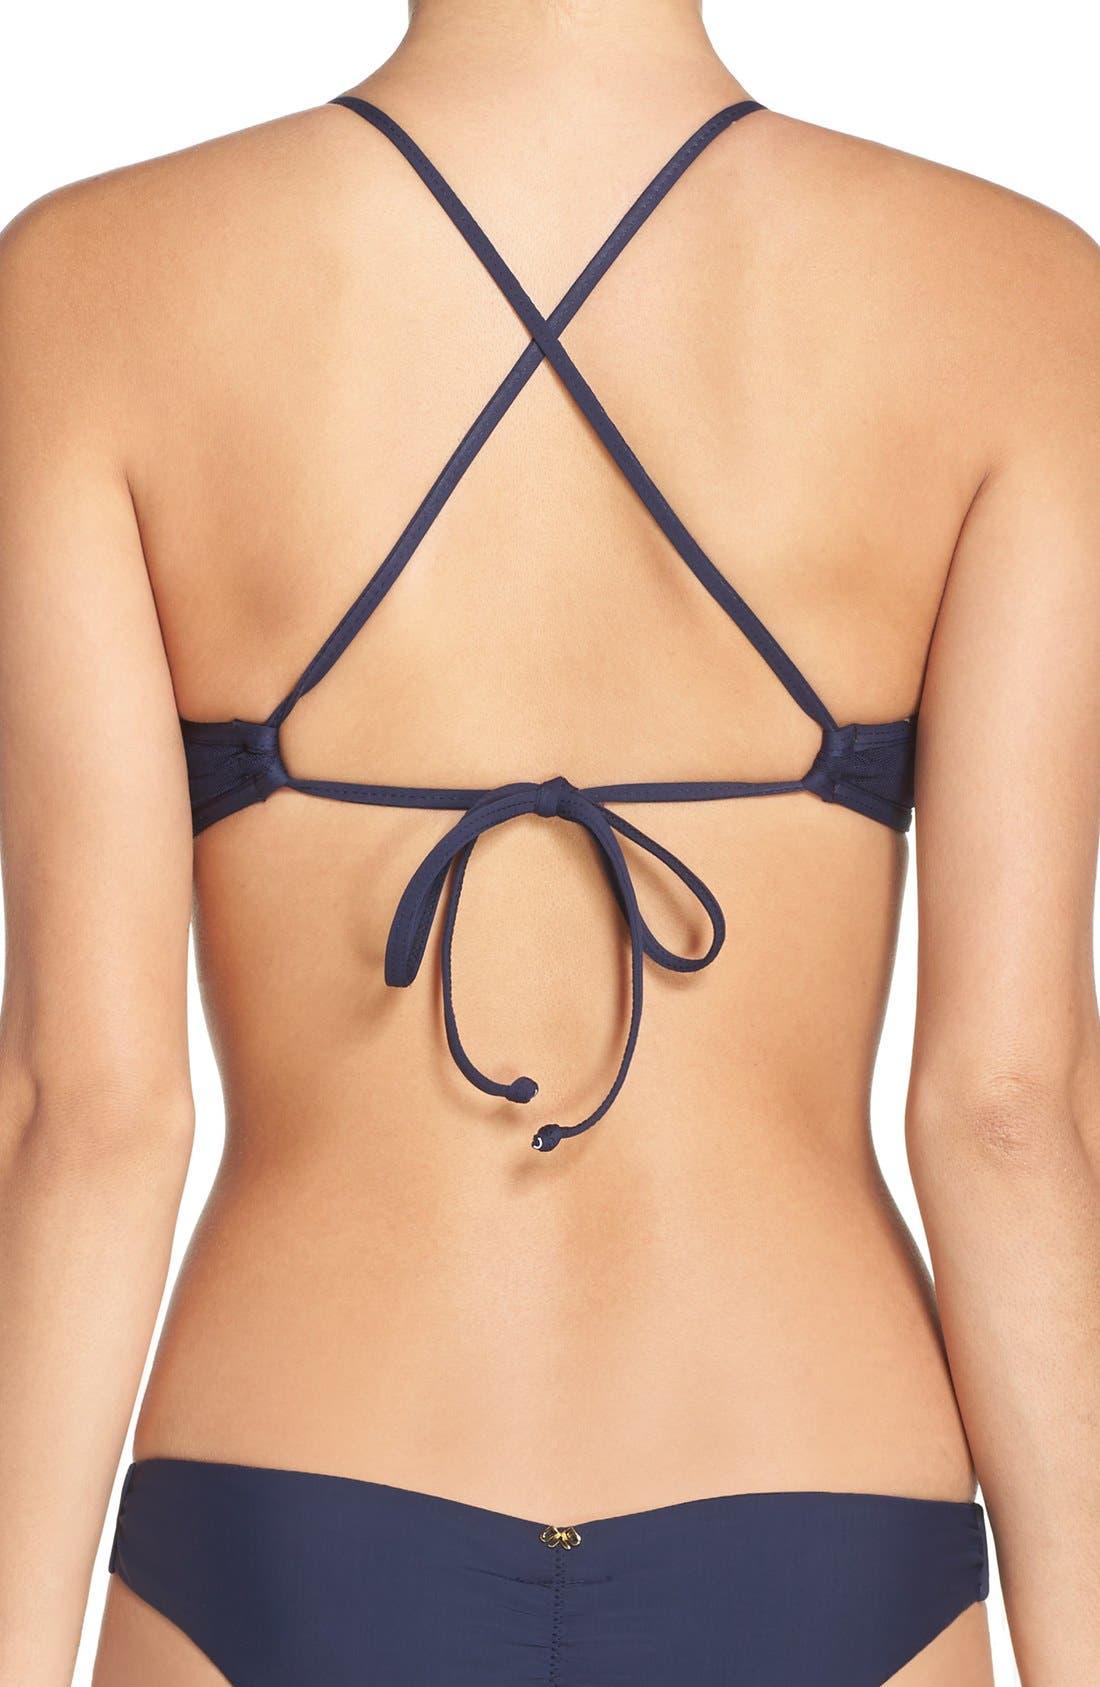 Sequin Bikini Top,                             Alternate thumbnail 11, color,                             401